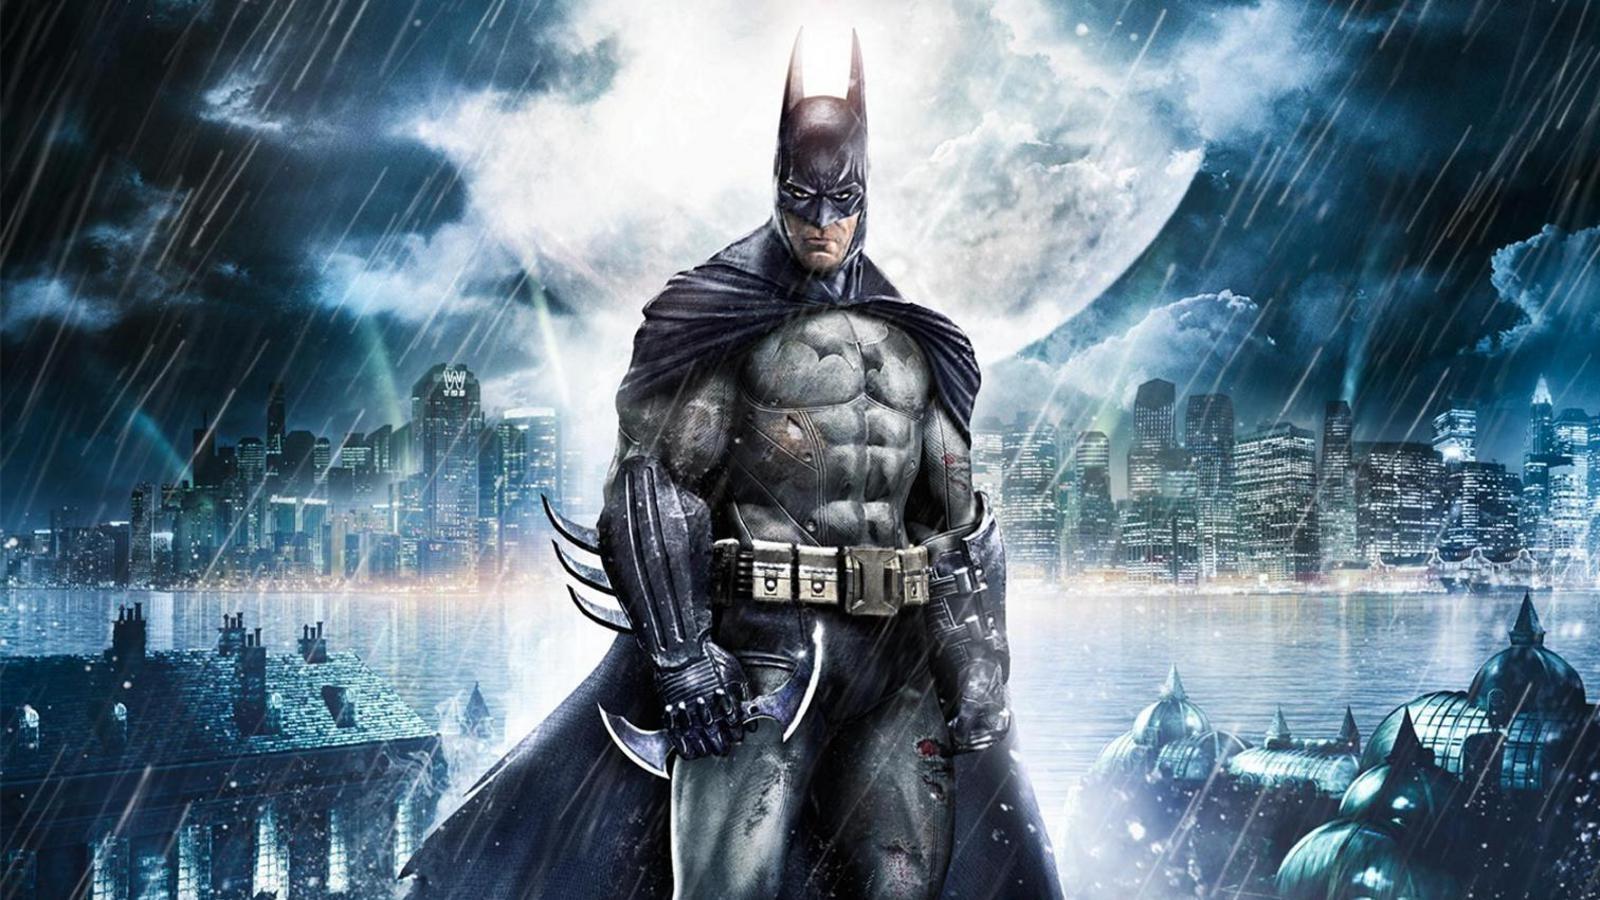 batman begins research paper